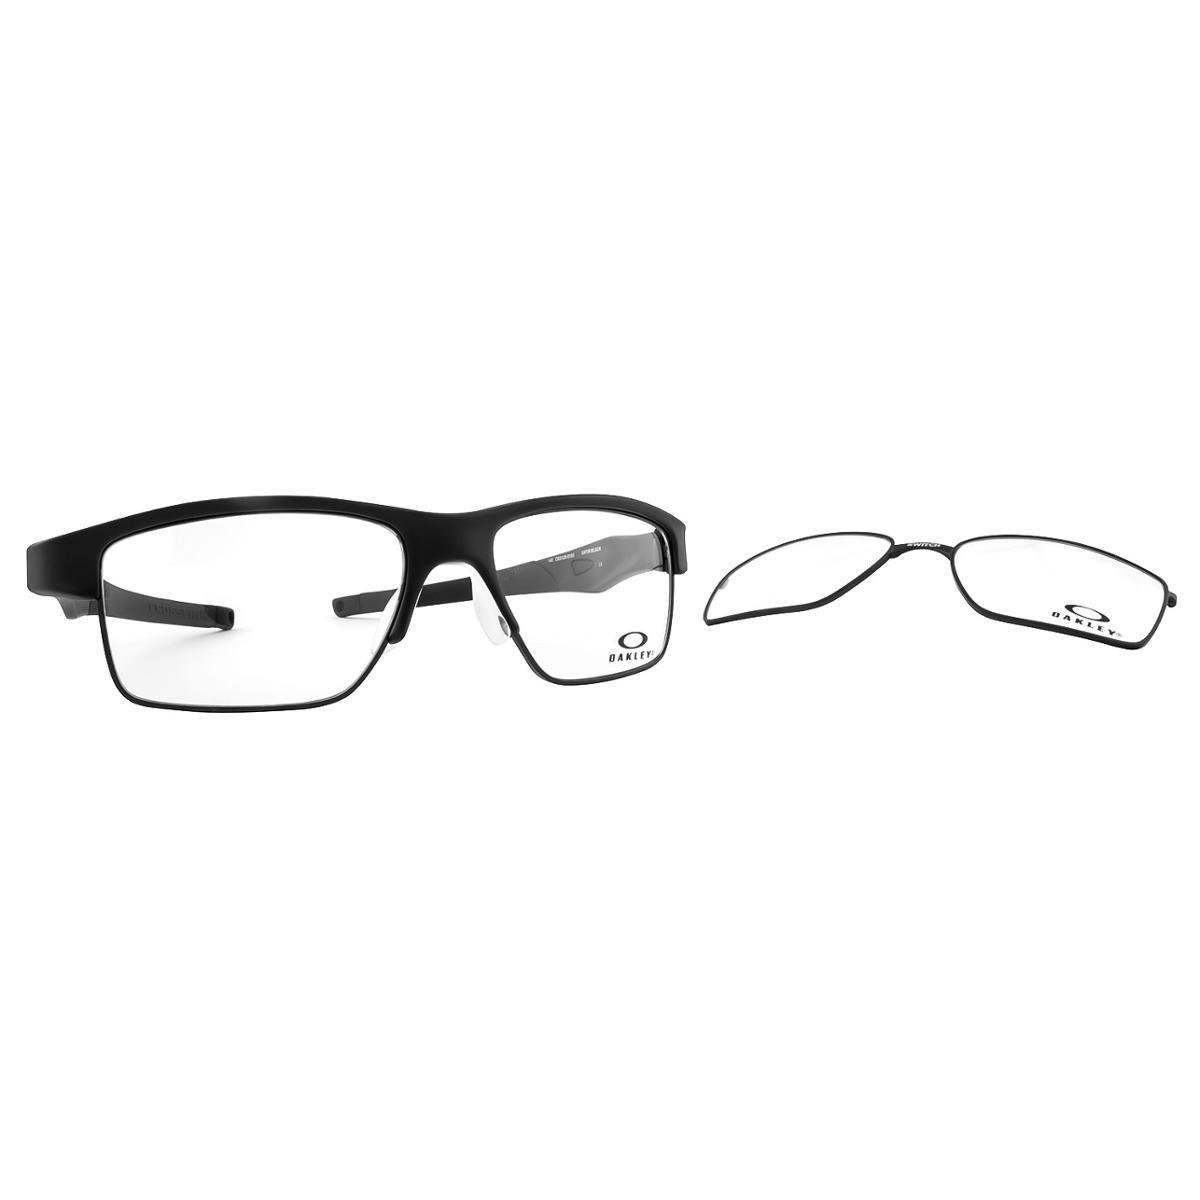 9c9a494e3a631 Óculos de Grau Oakley Crosslink Switch OX3128 01-55 Masculino ...